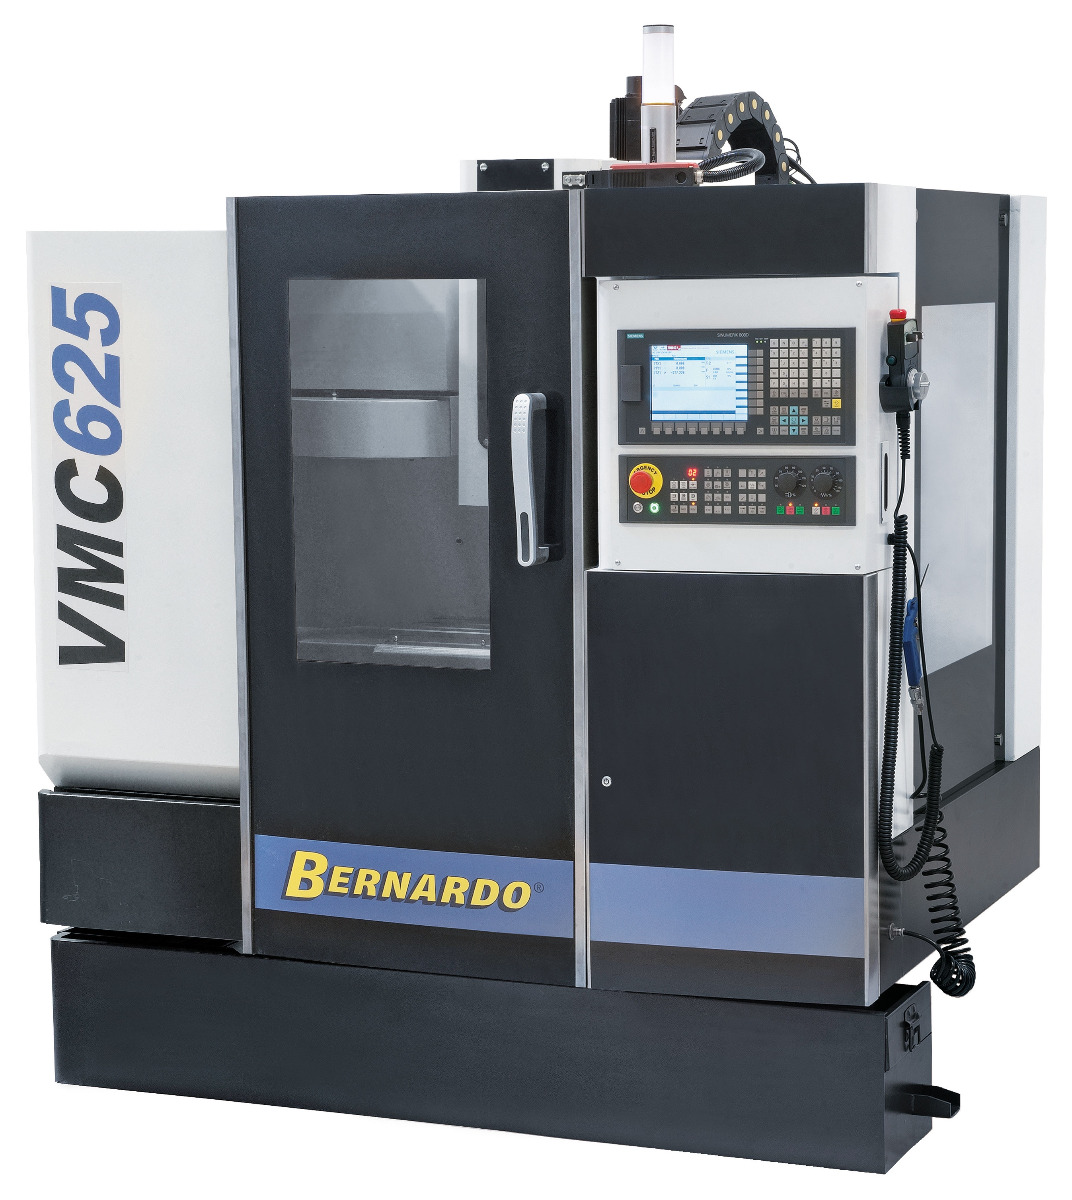 Centrum obróbcze CNC do metalu - VMC 625 SIEMENS SINUMERIK 808D BERNARDO